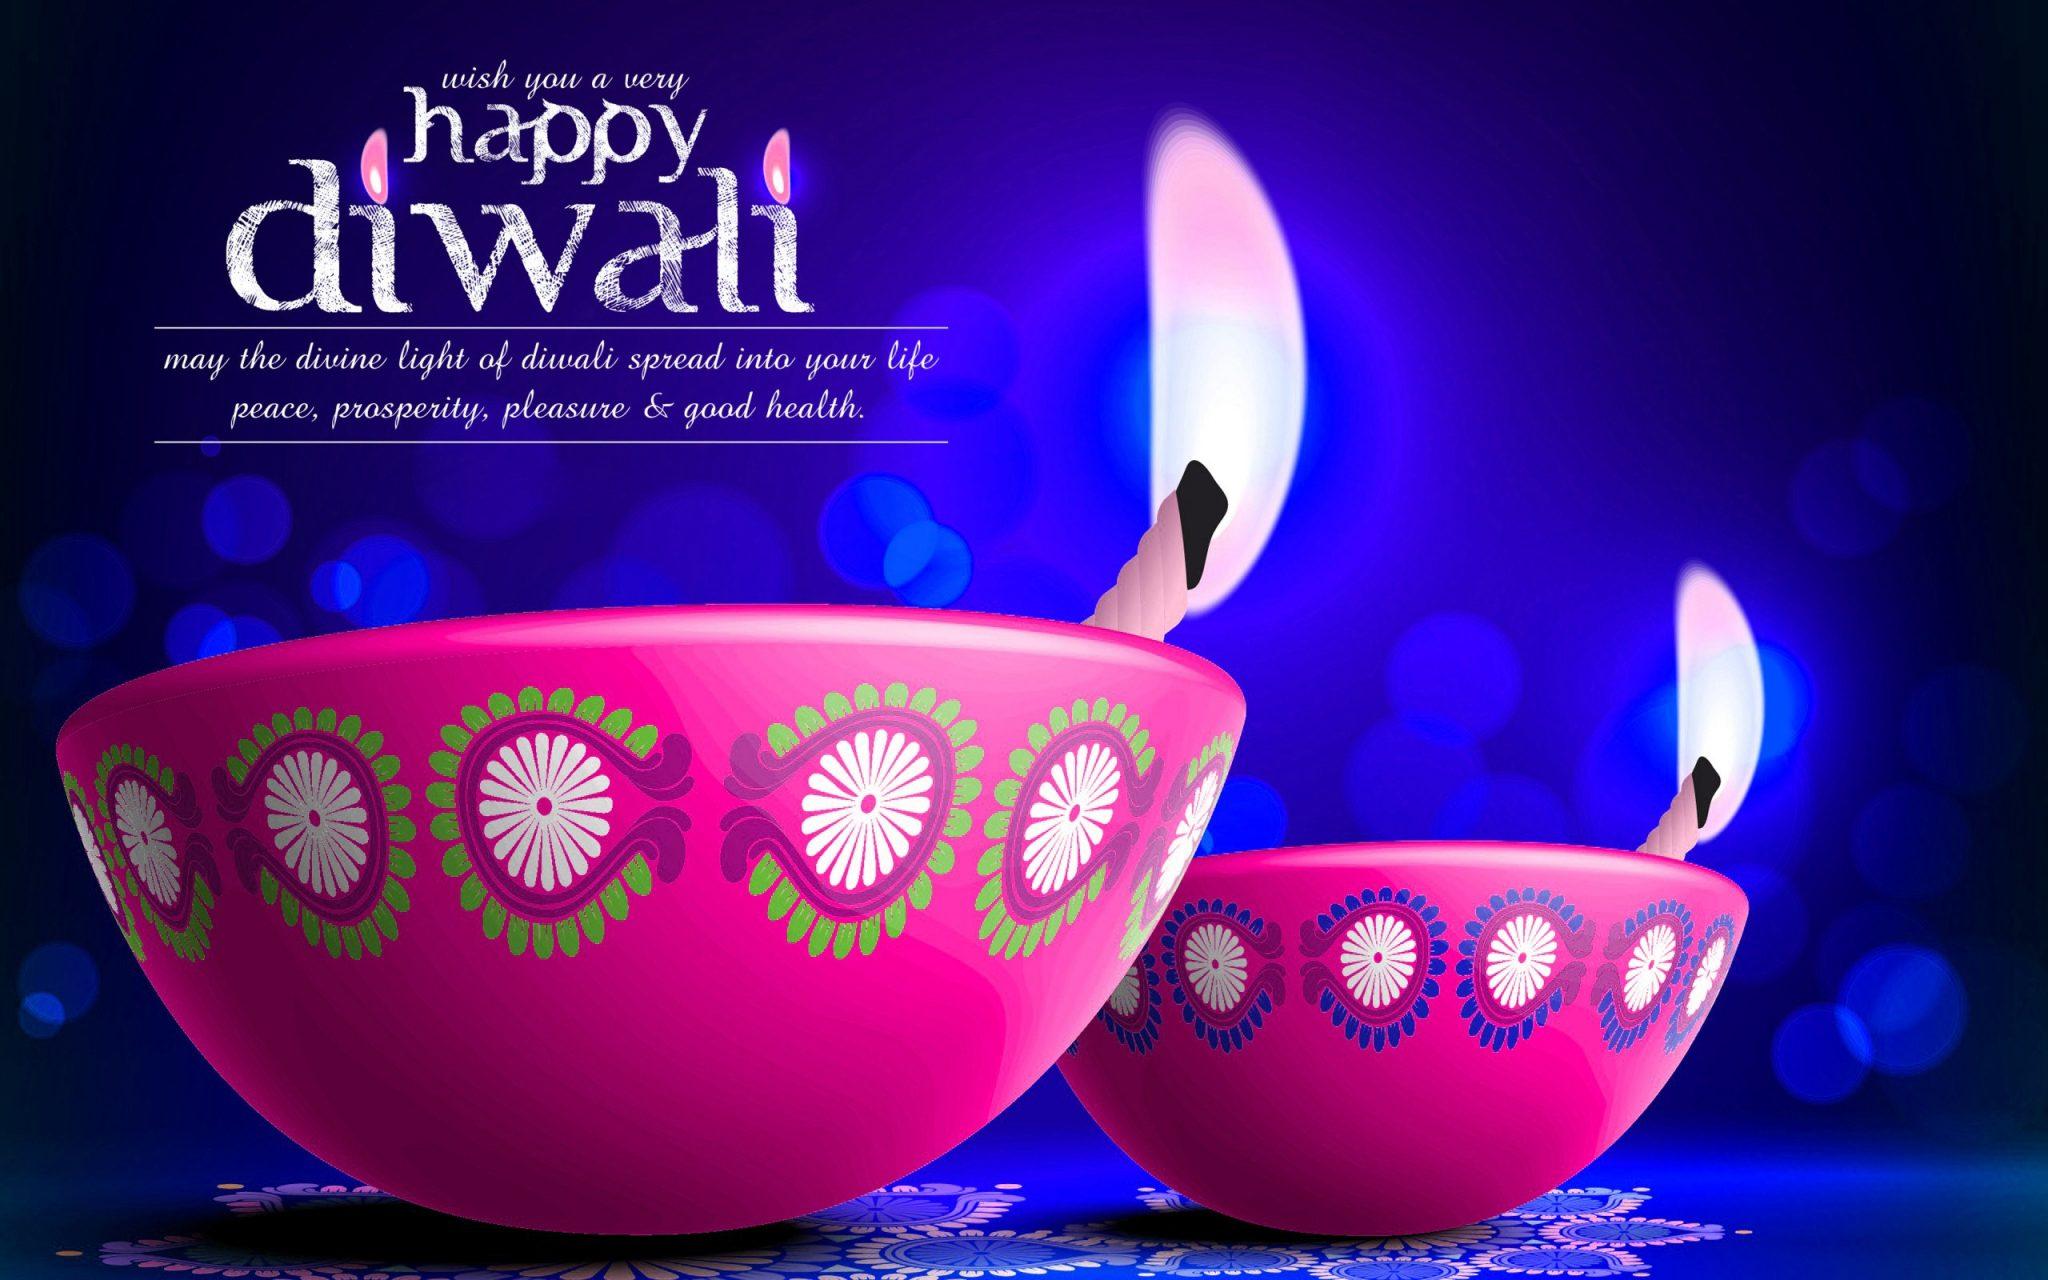 Happy Diwali 2016 Messages